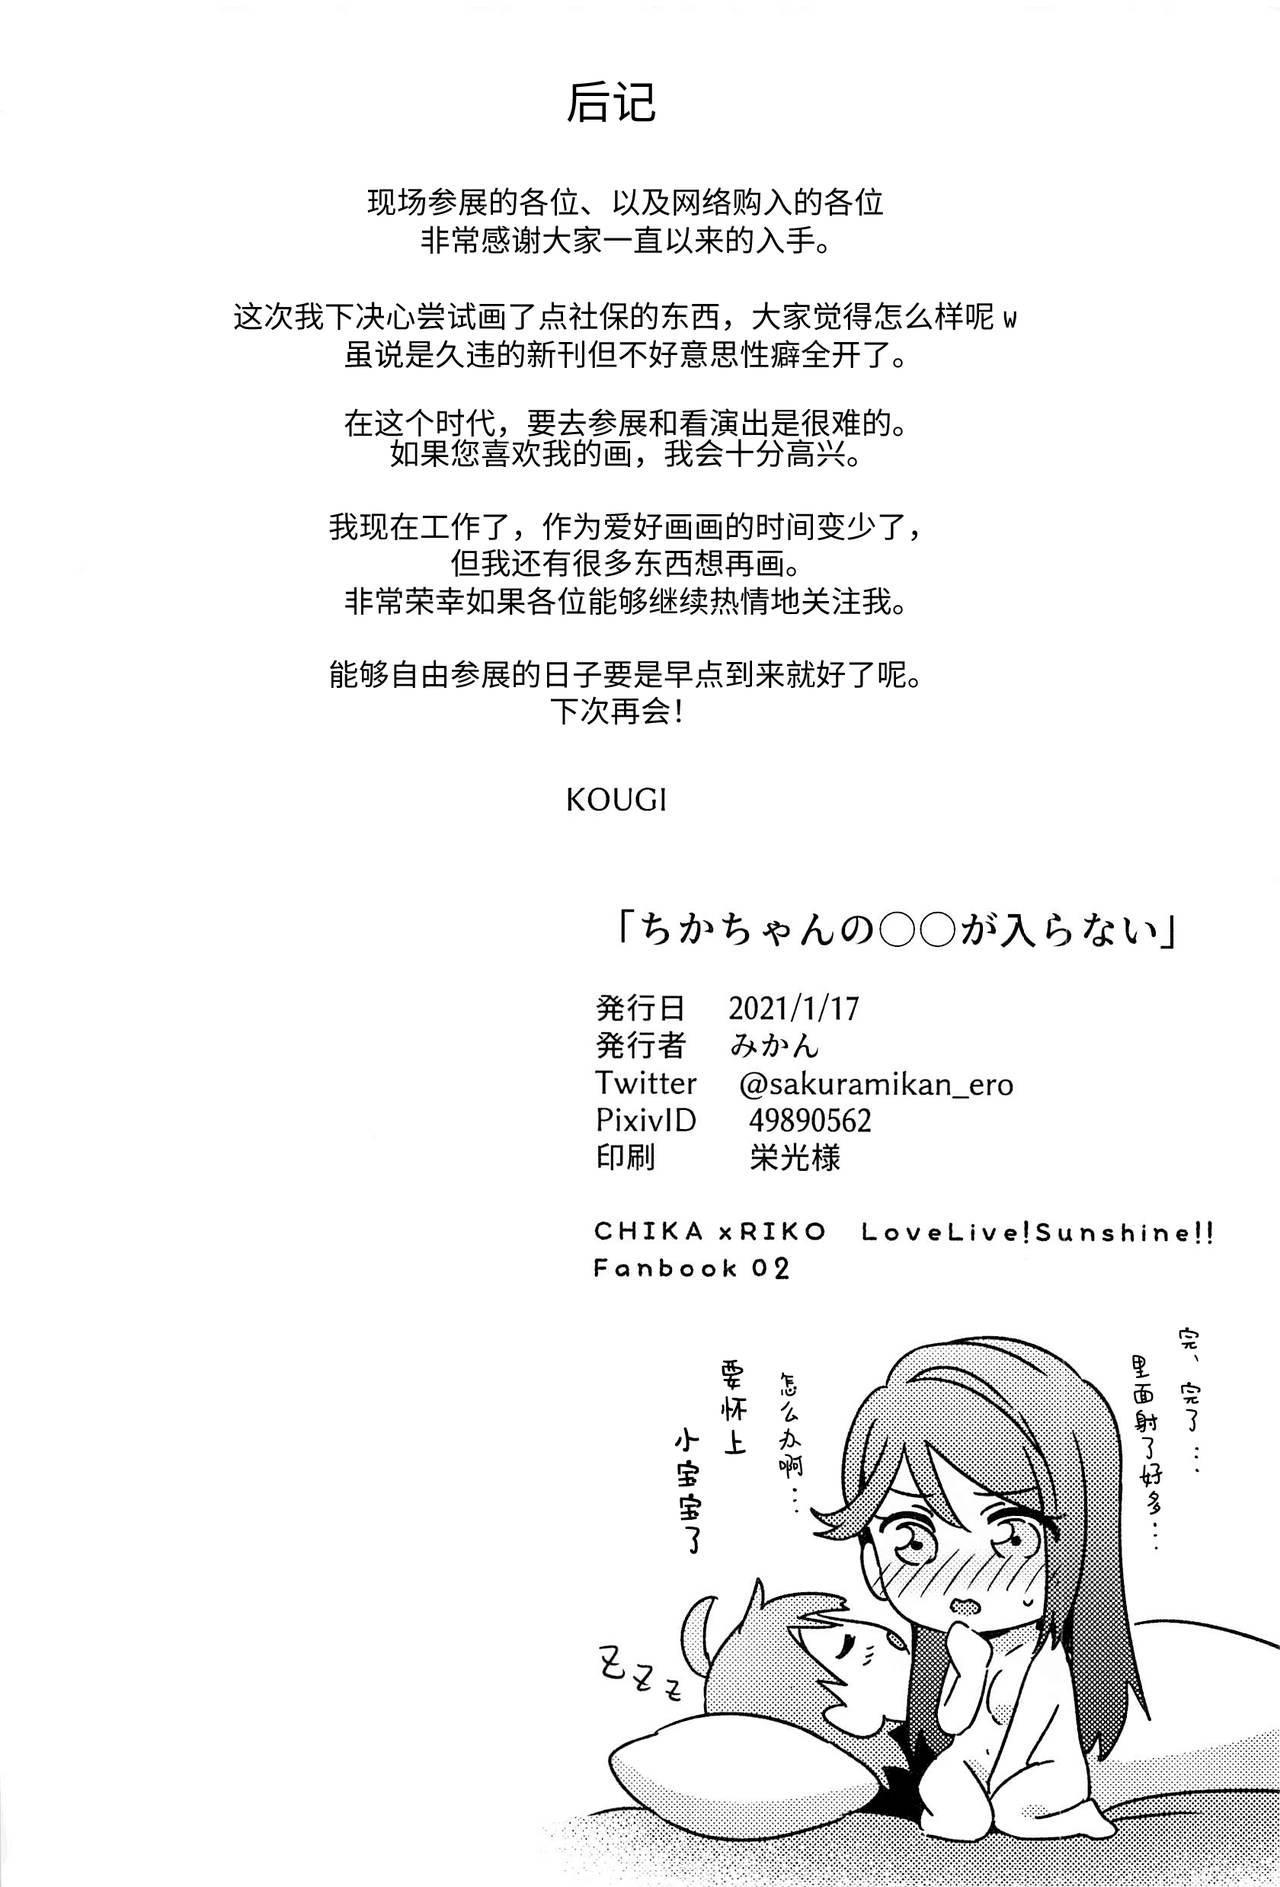 Chika-chan no ○○ ga Hairanai | 千歌的丁丁放不进来 33